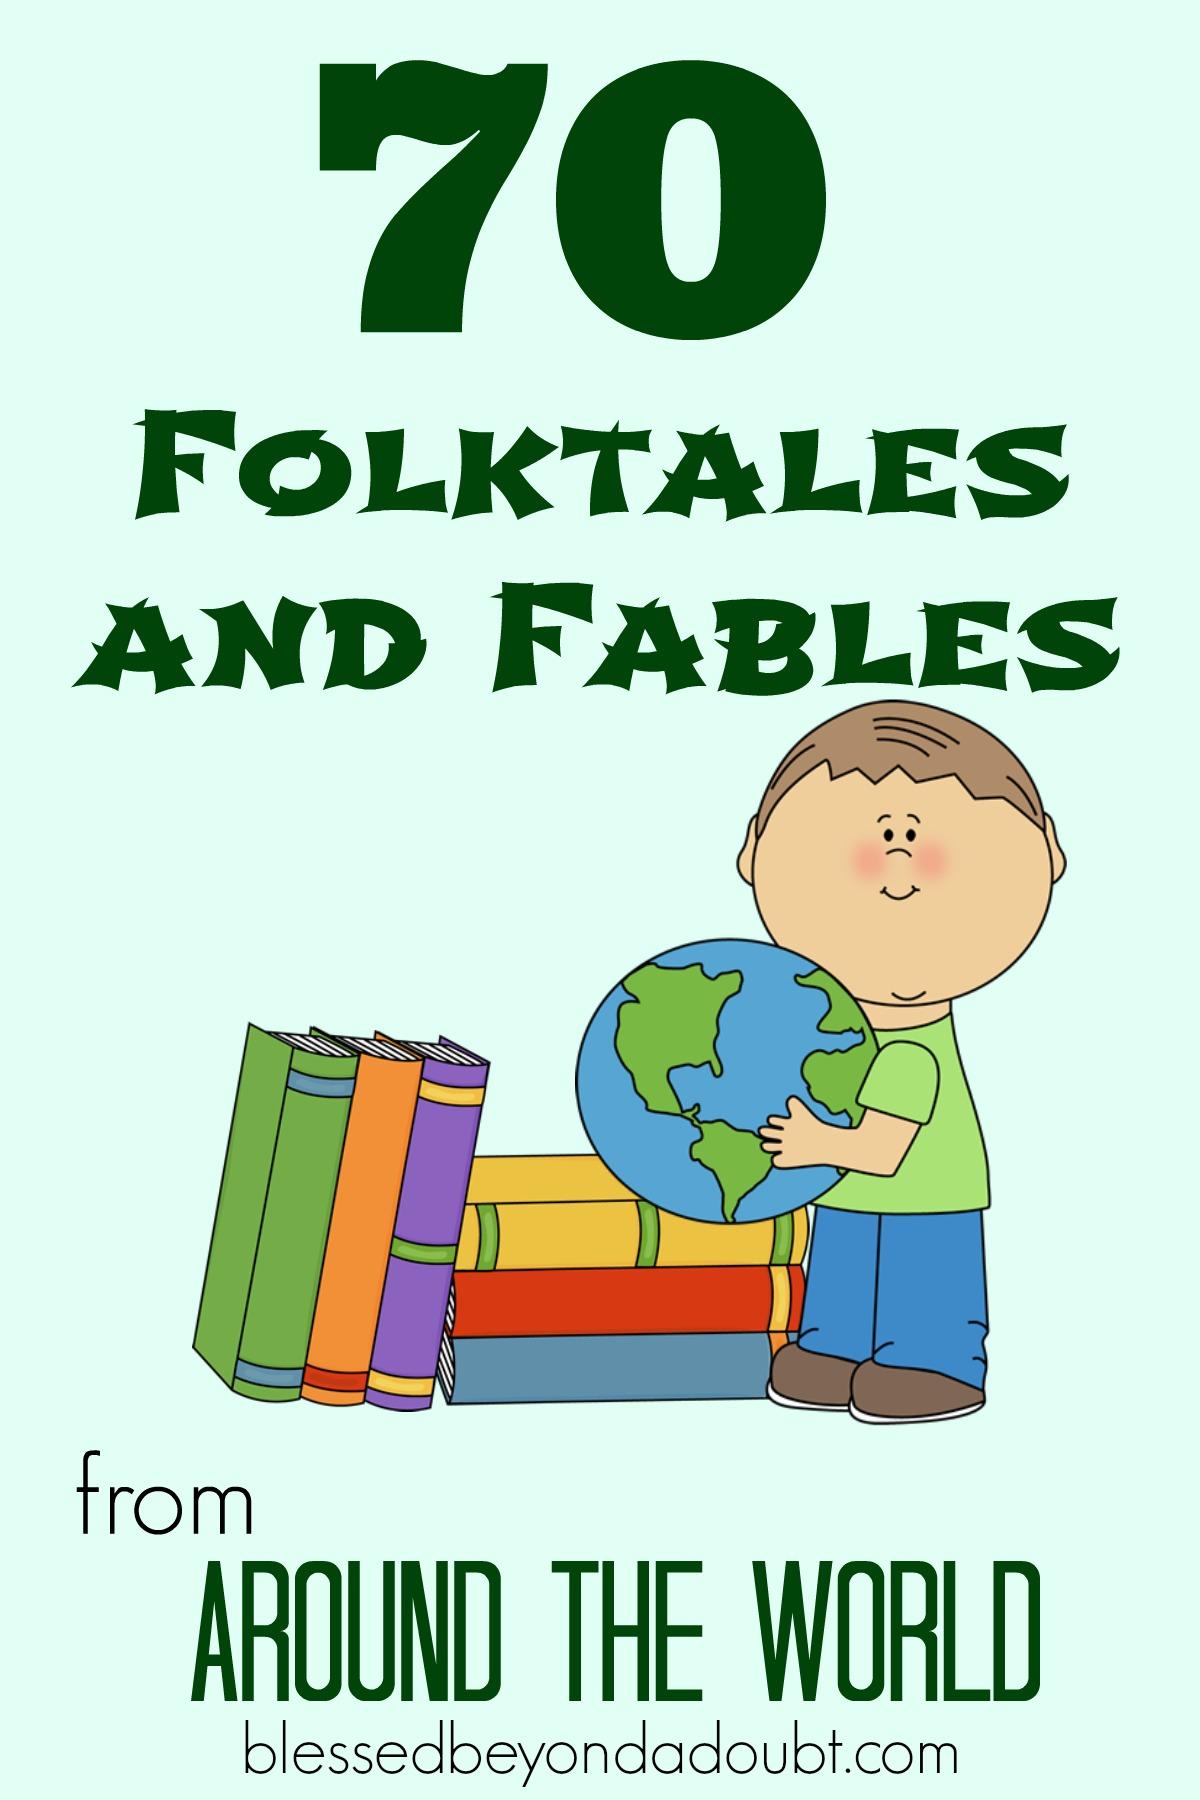 70 folktales